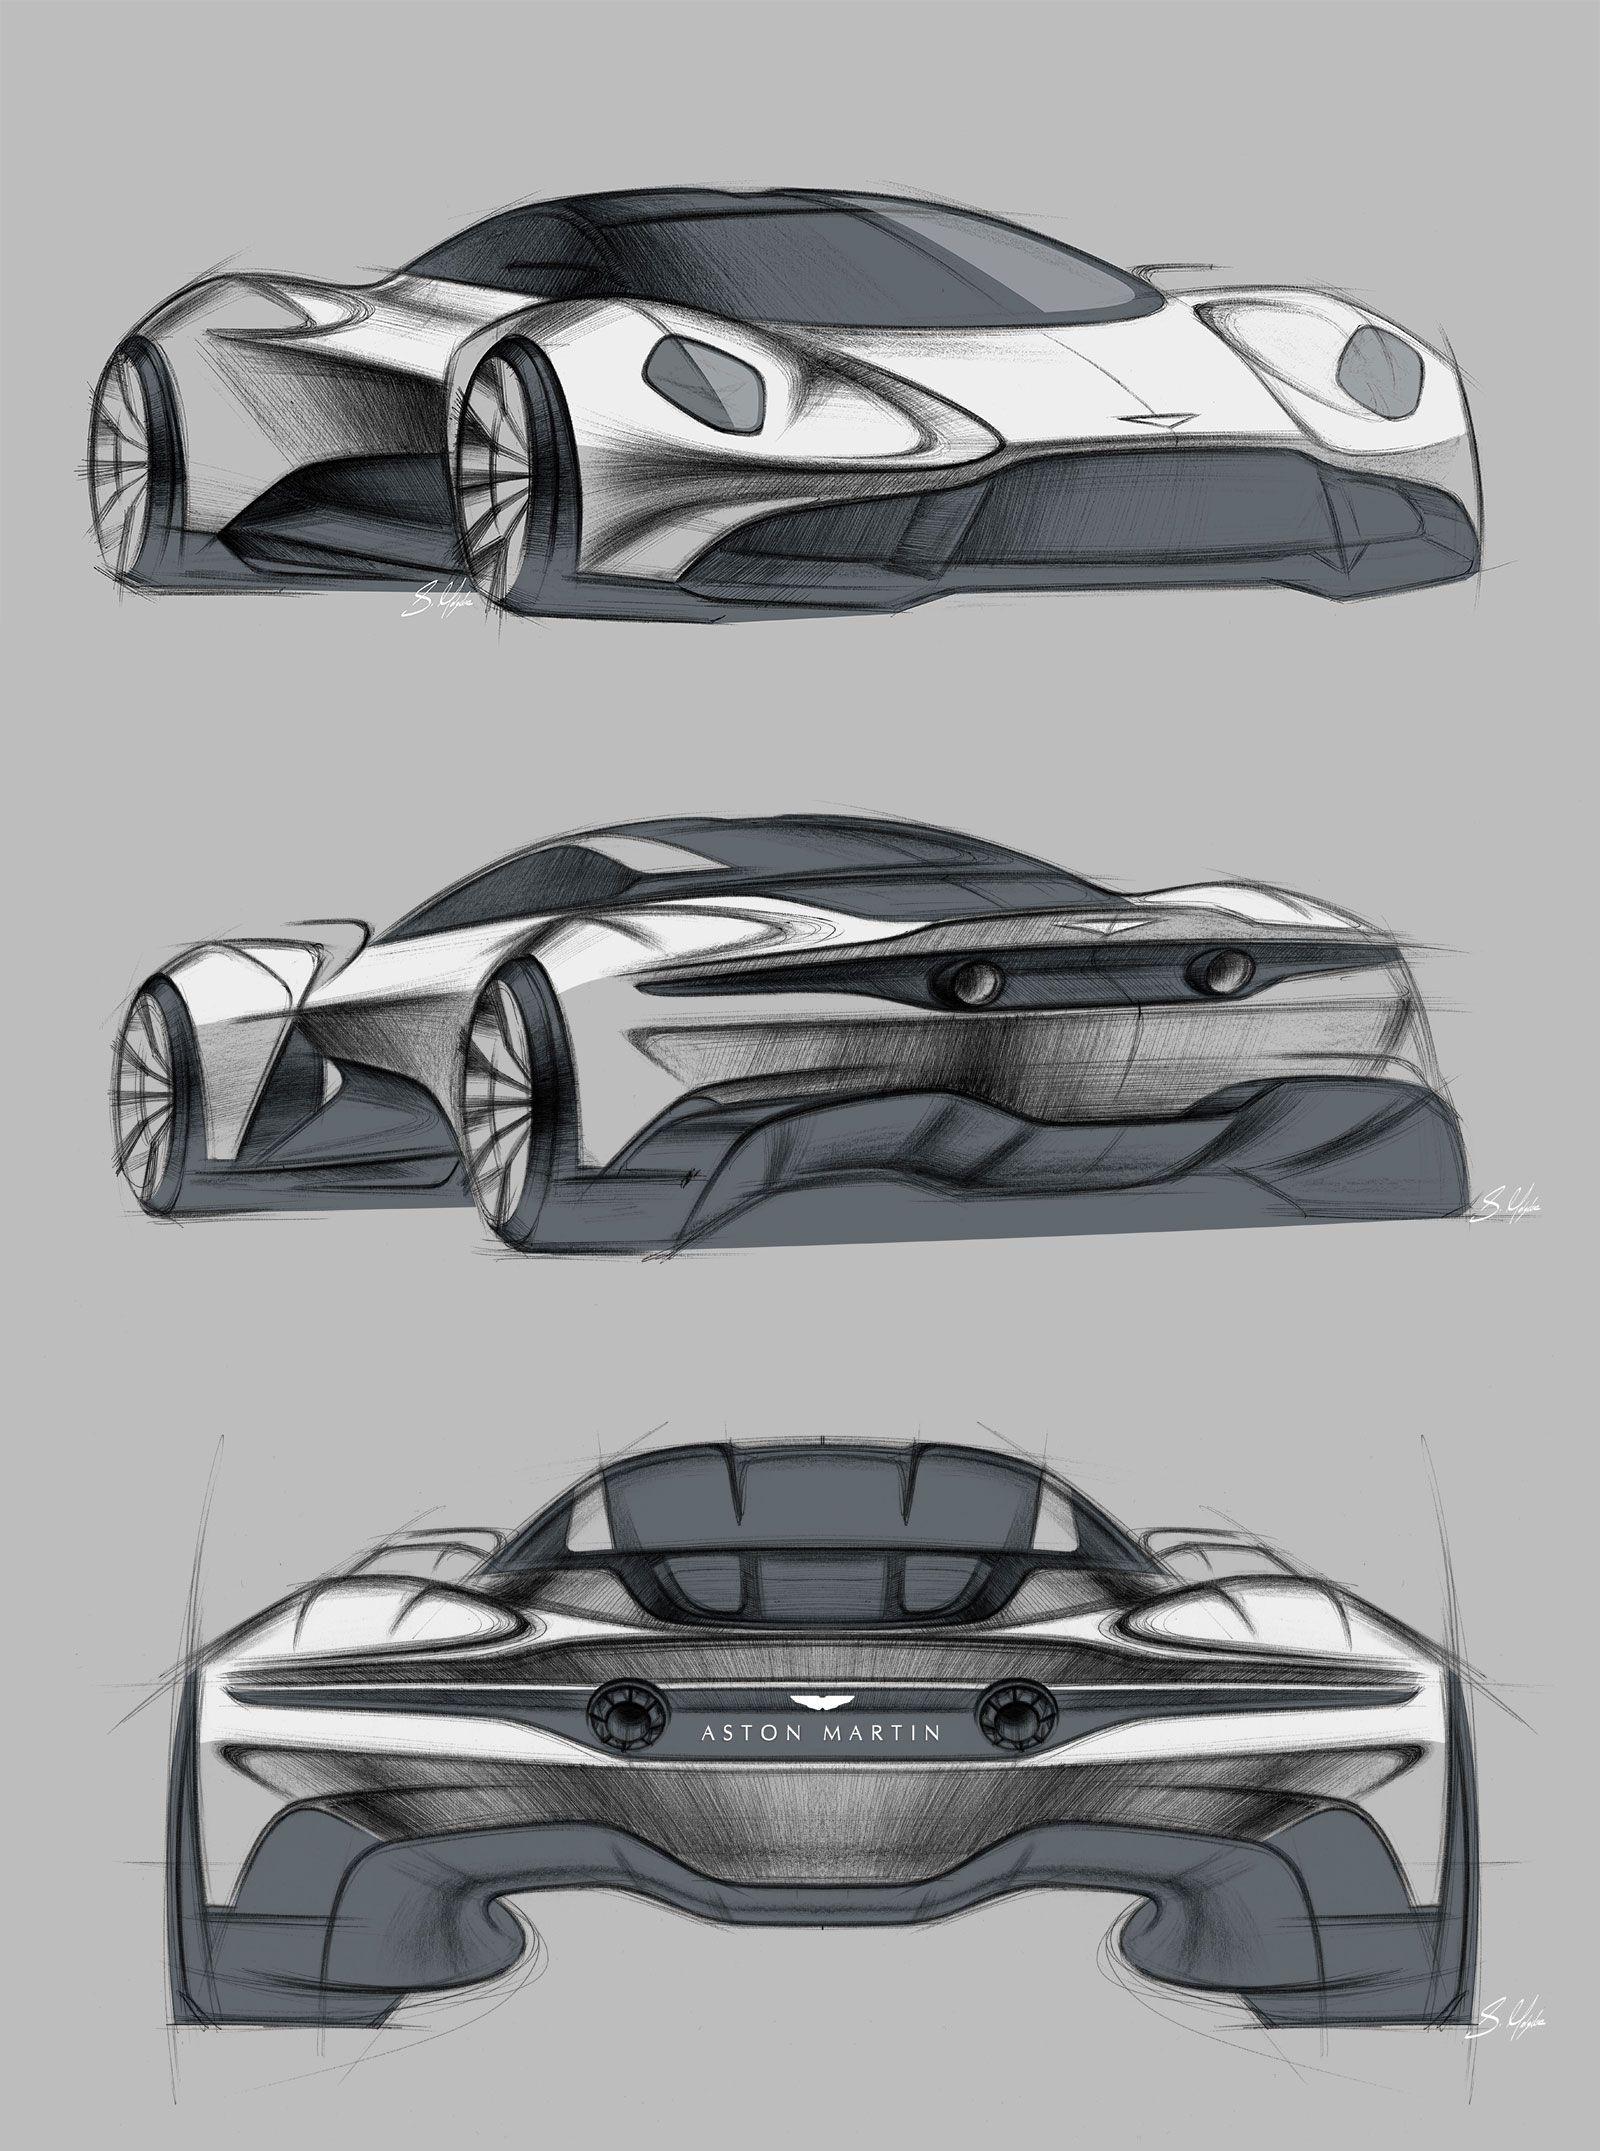 Astonmartin Conceptcar Cardesign Conceptcars Futuristiccars Design Futuristic Autodesign Automotive Ca Car Design Aston Martin Vanquish Design Sketch